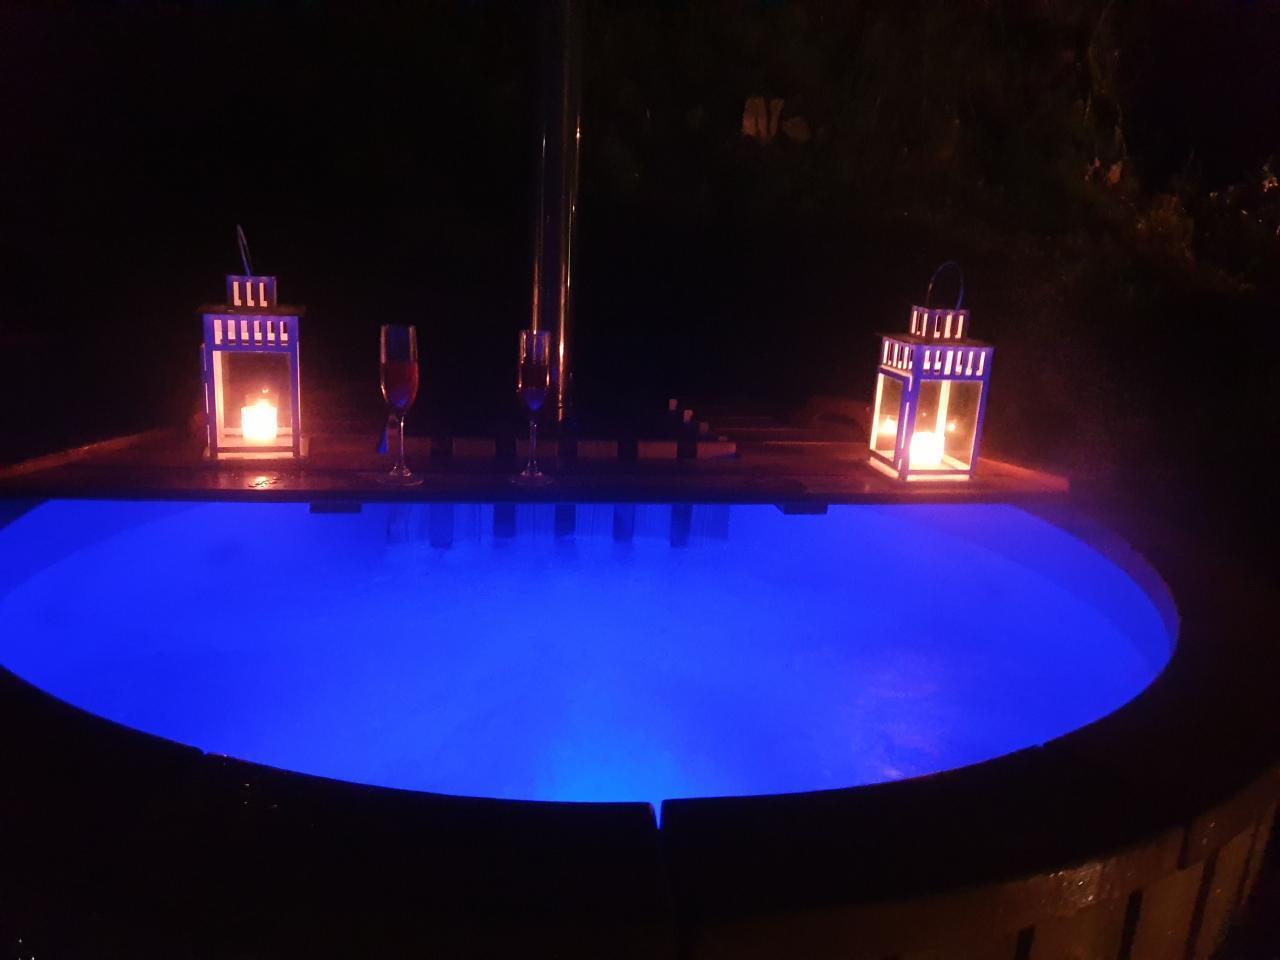 Maison de vacances Casetta Eoliana Lipari Inseln, pool, sauna. (827872), Lipari, Lipari, Sicile, Italie, image 32